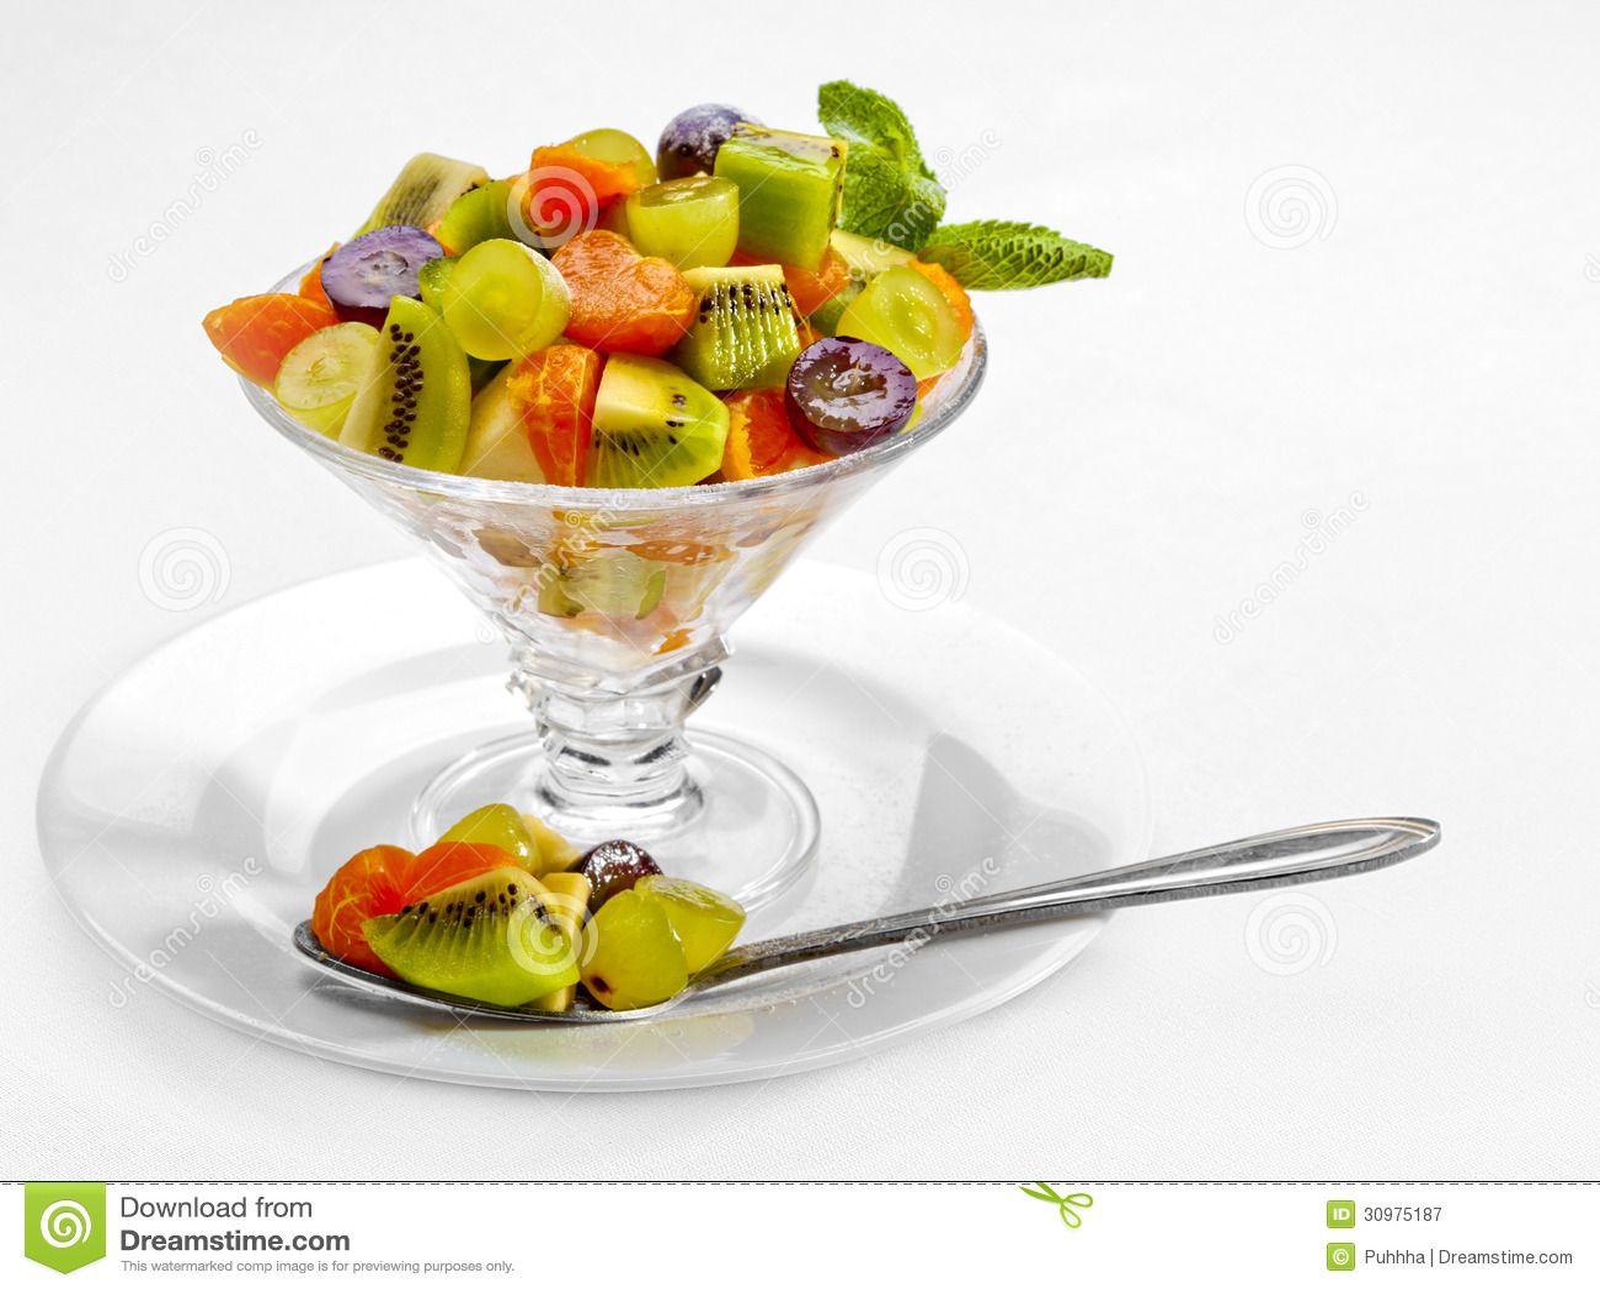 A Tasty Food. Fresh Fruits Salad. High Quality Image ...